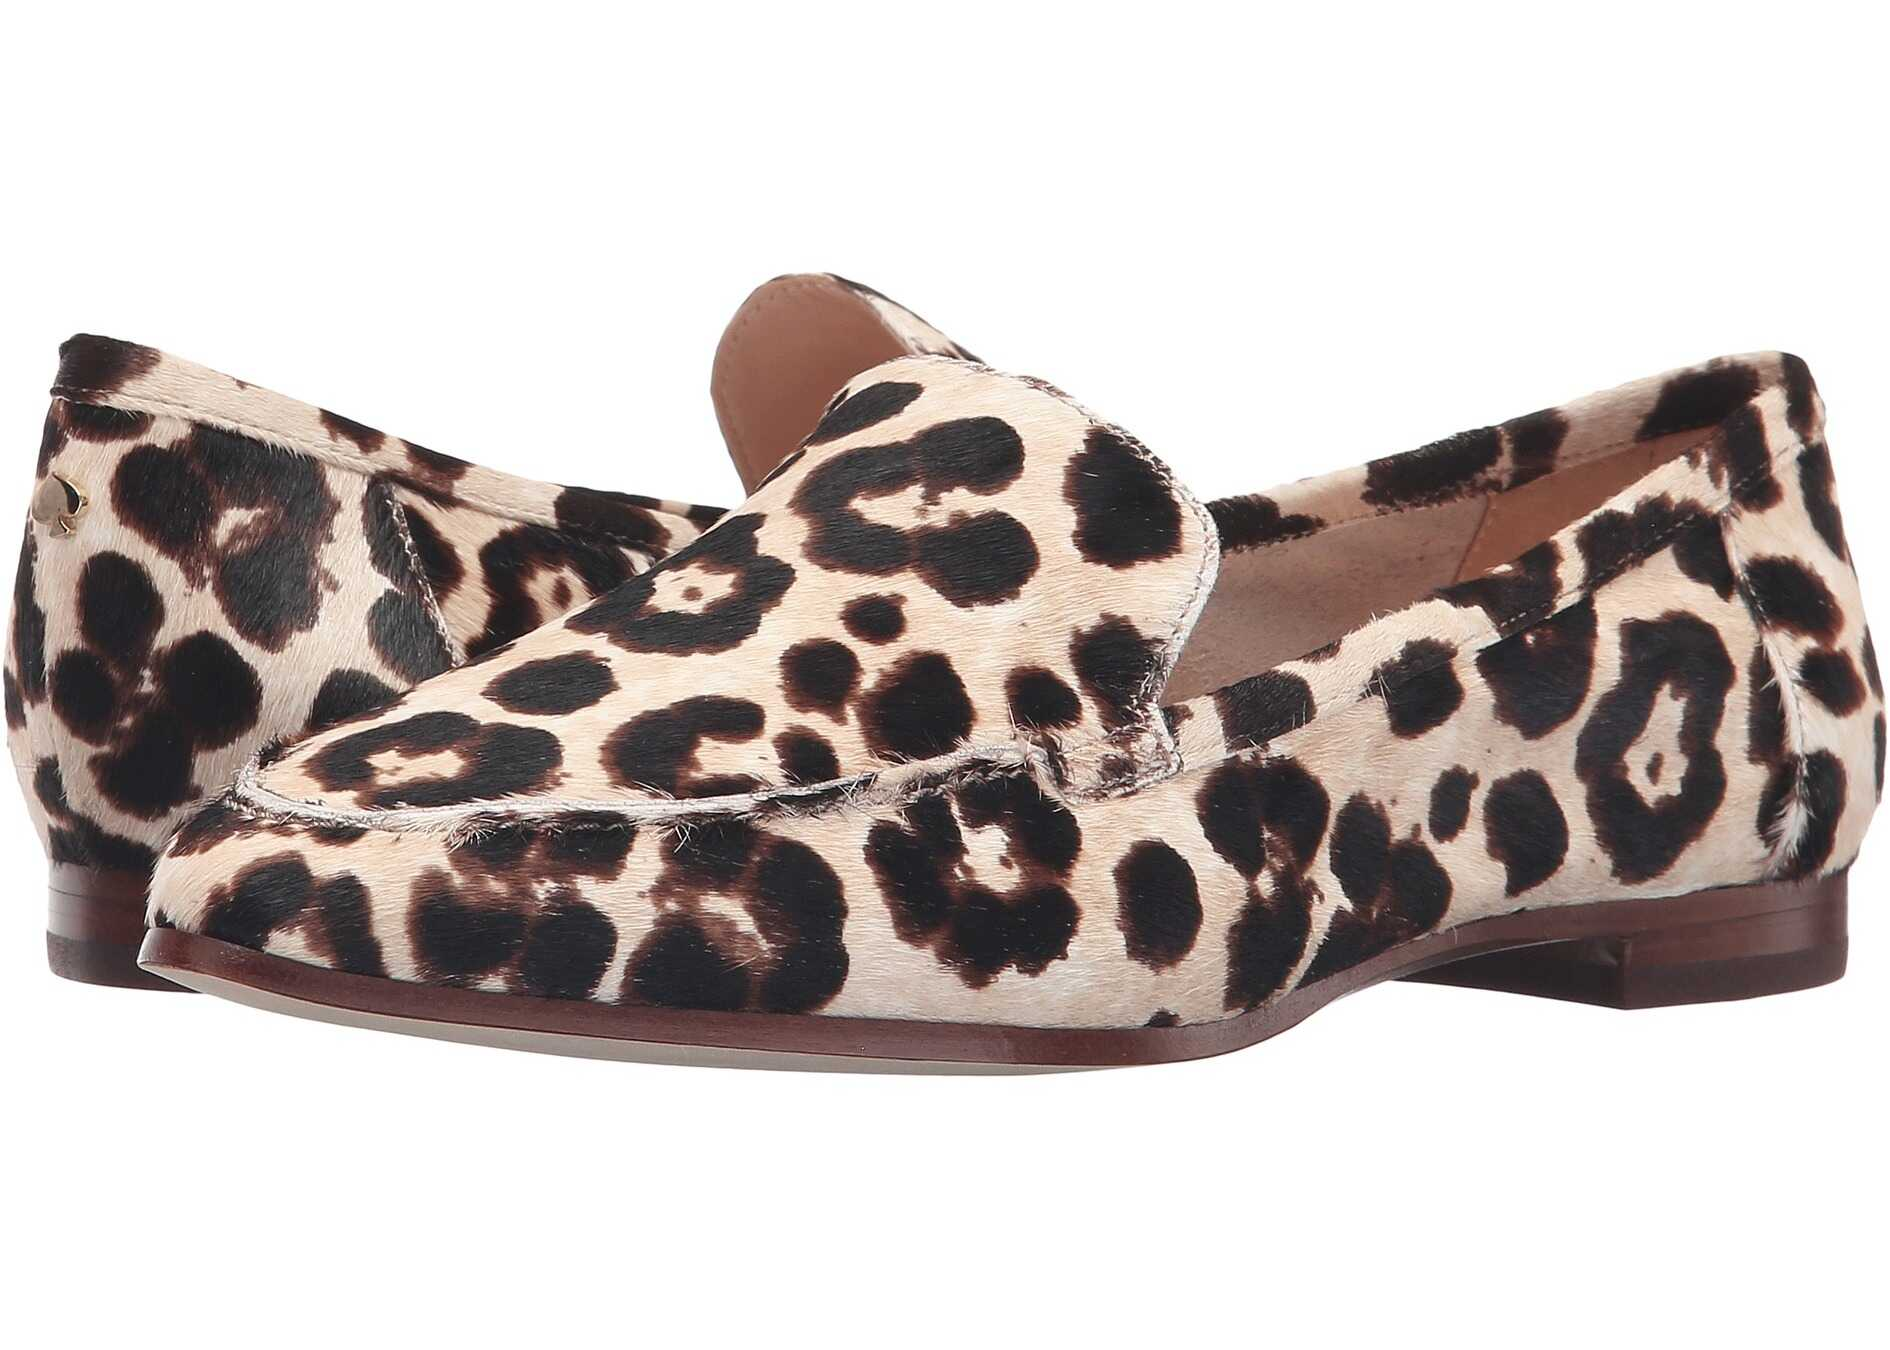 Kate Spade New York Carima Blush/Brown Leopard Haircalf Print